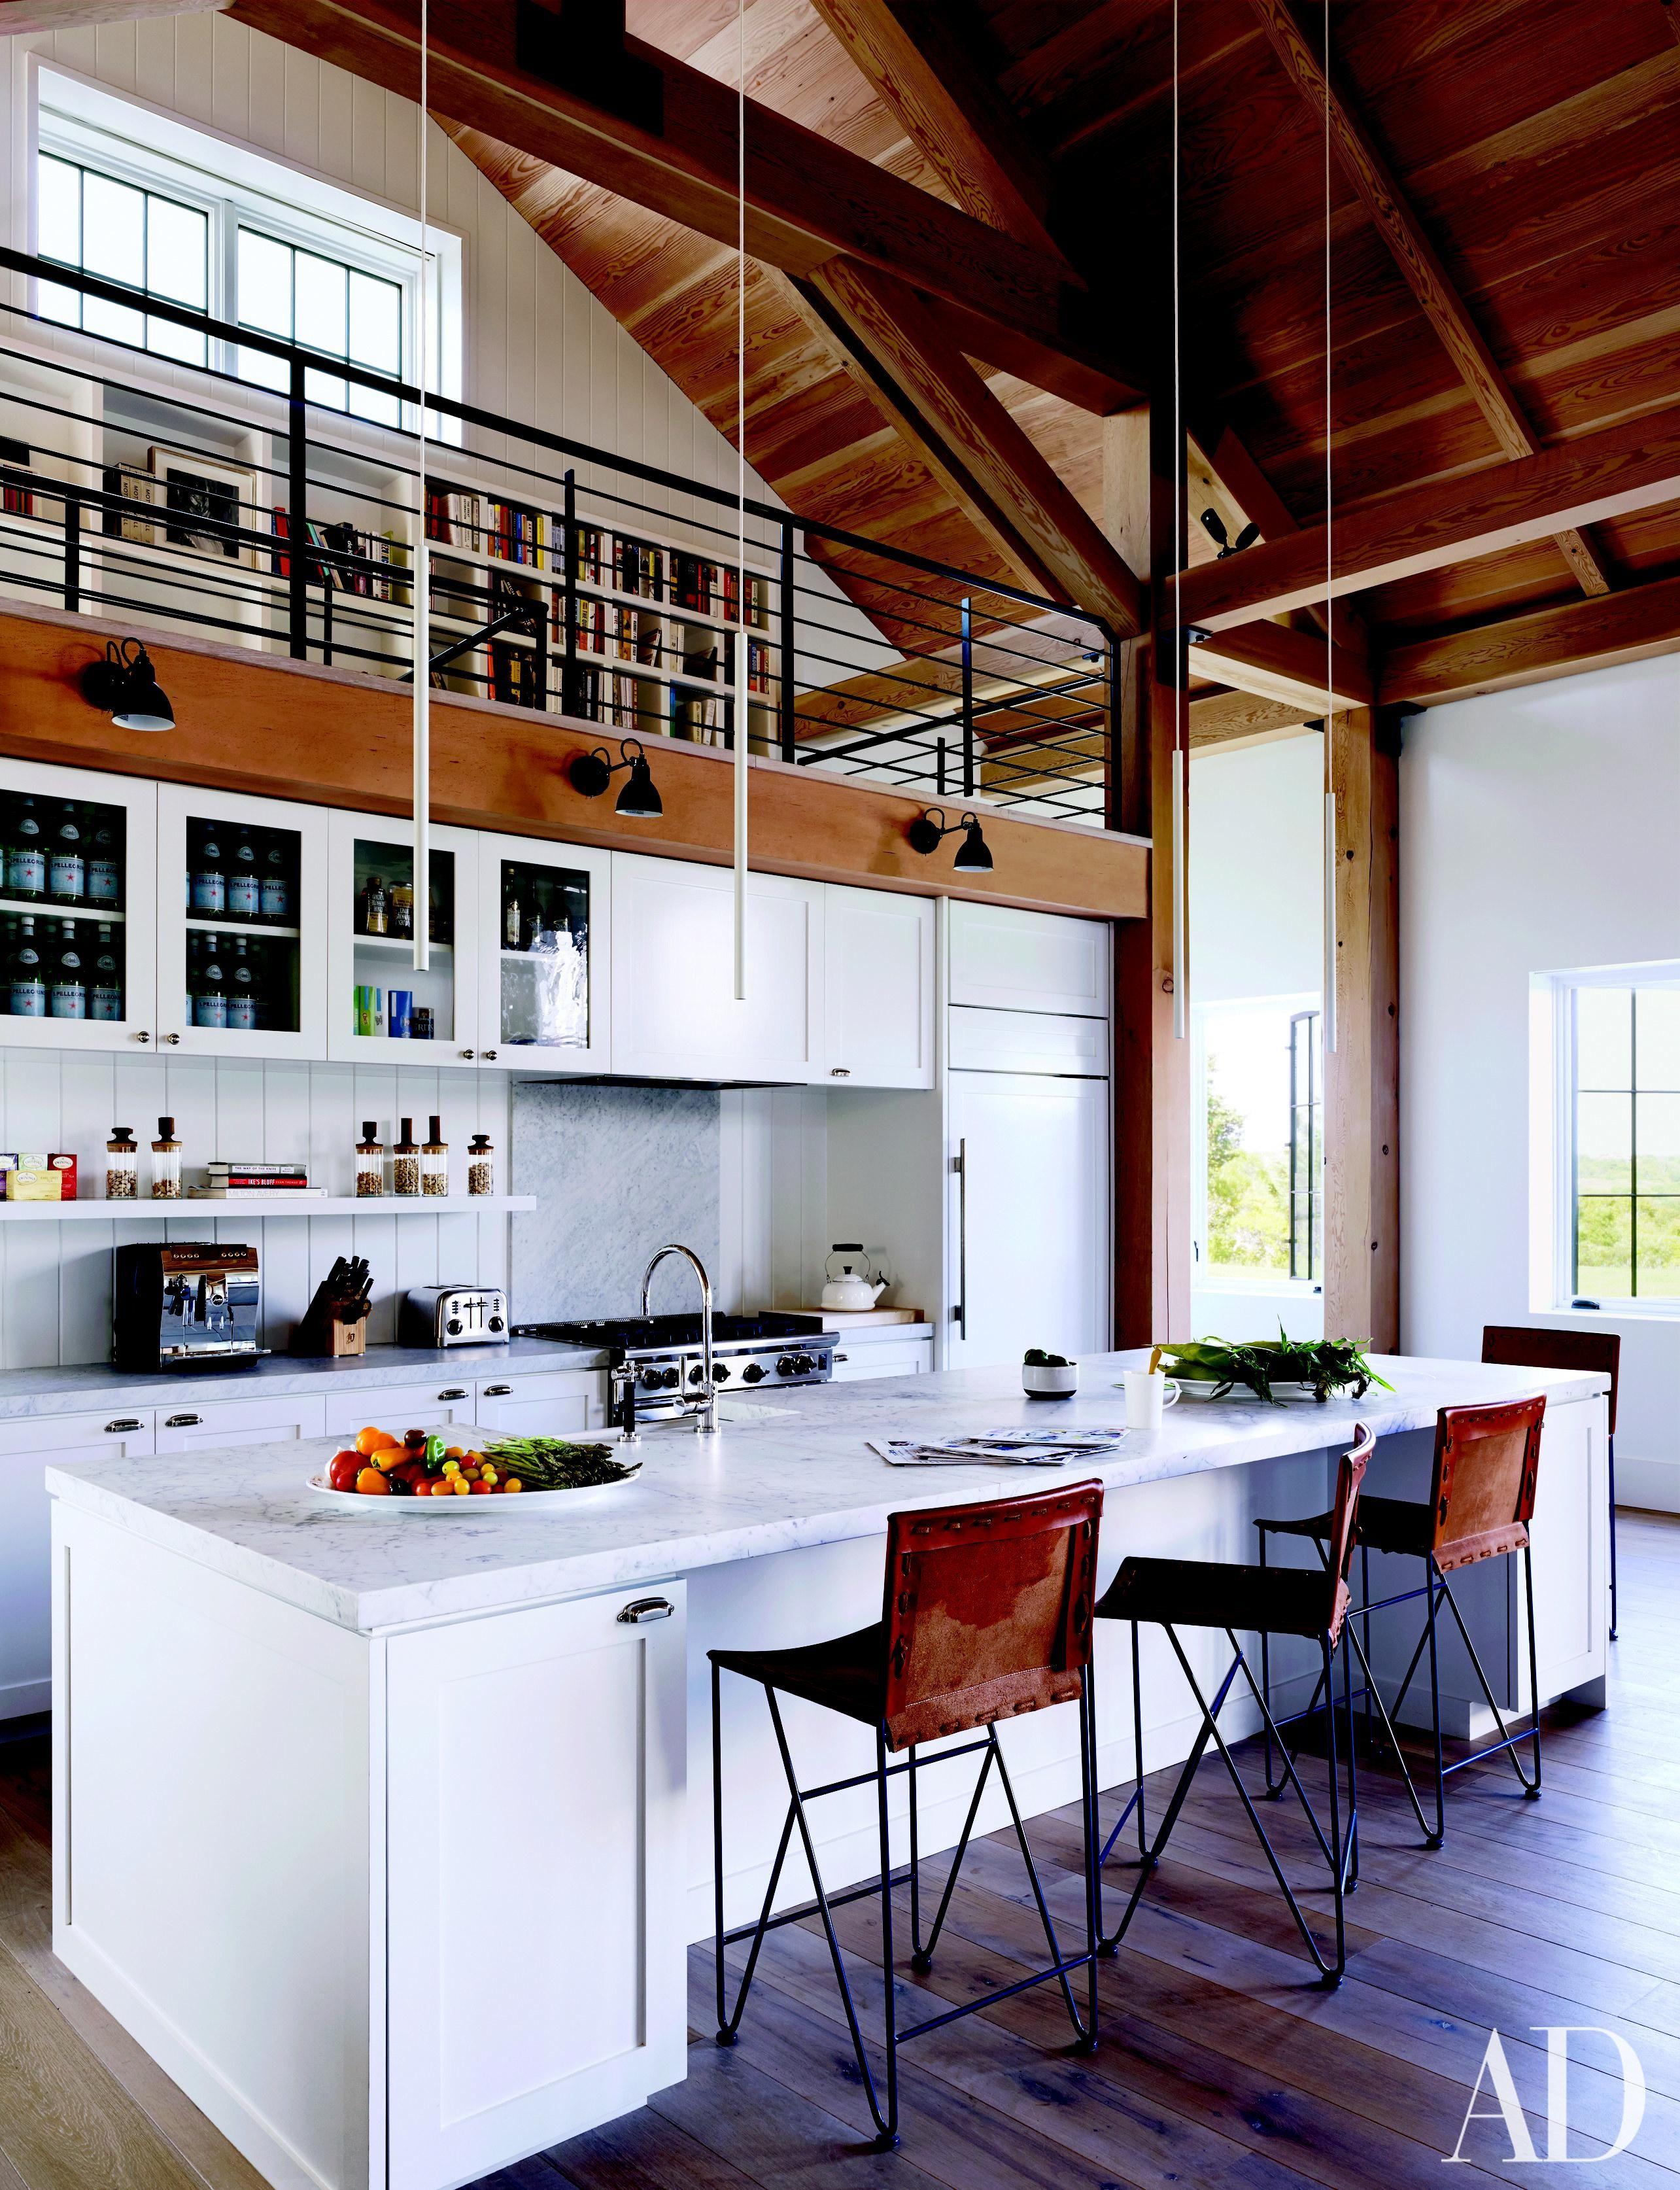 Get The Look Of This Modern Beach House Kitchen By Ashe Leandro Beach House Kitchens Home Kitchens Interior Design Kitchen